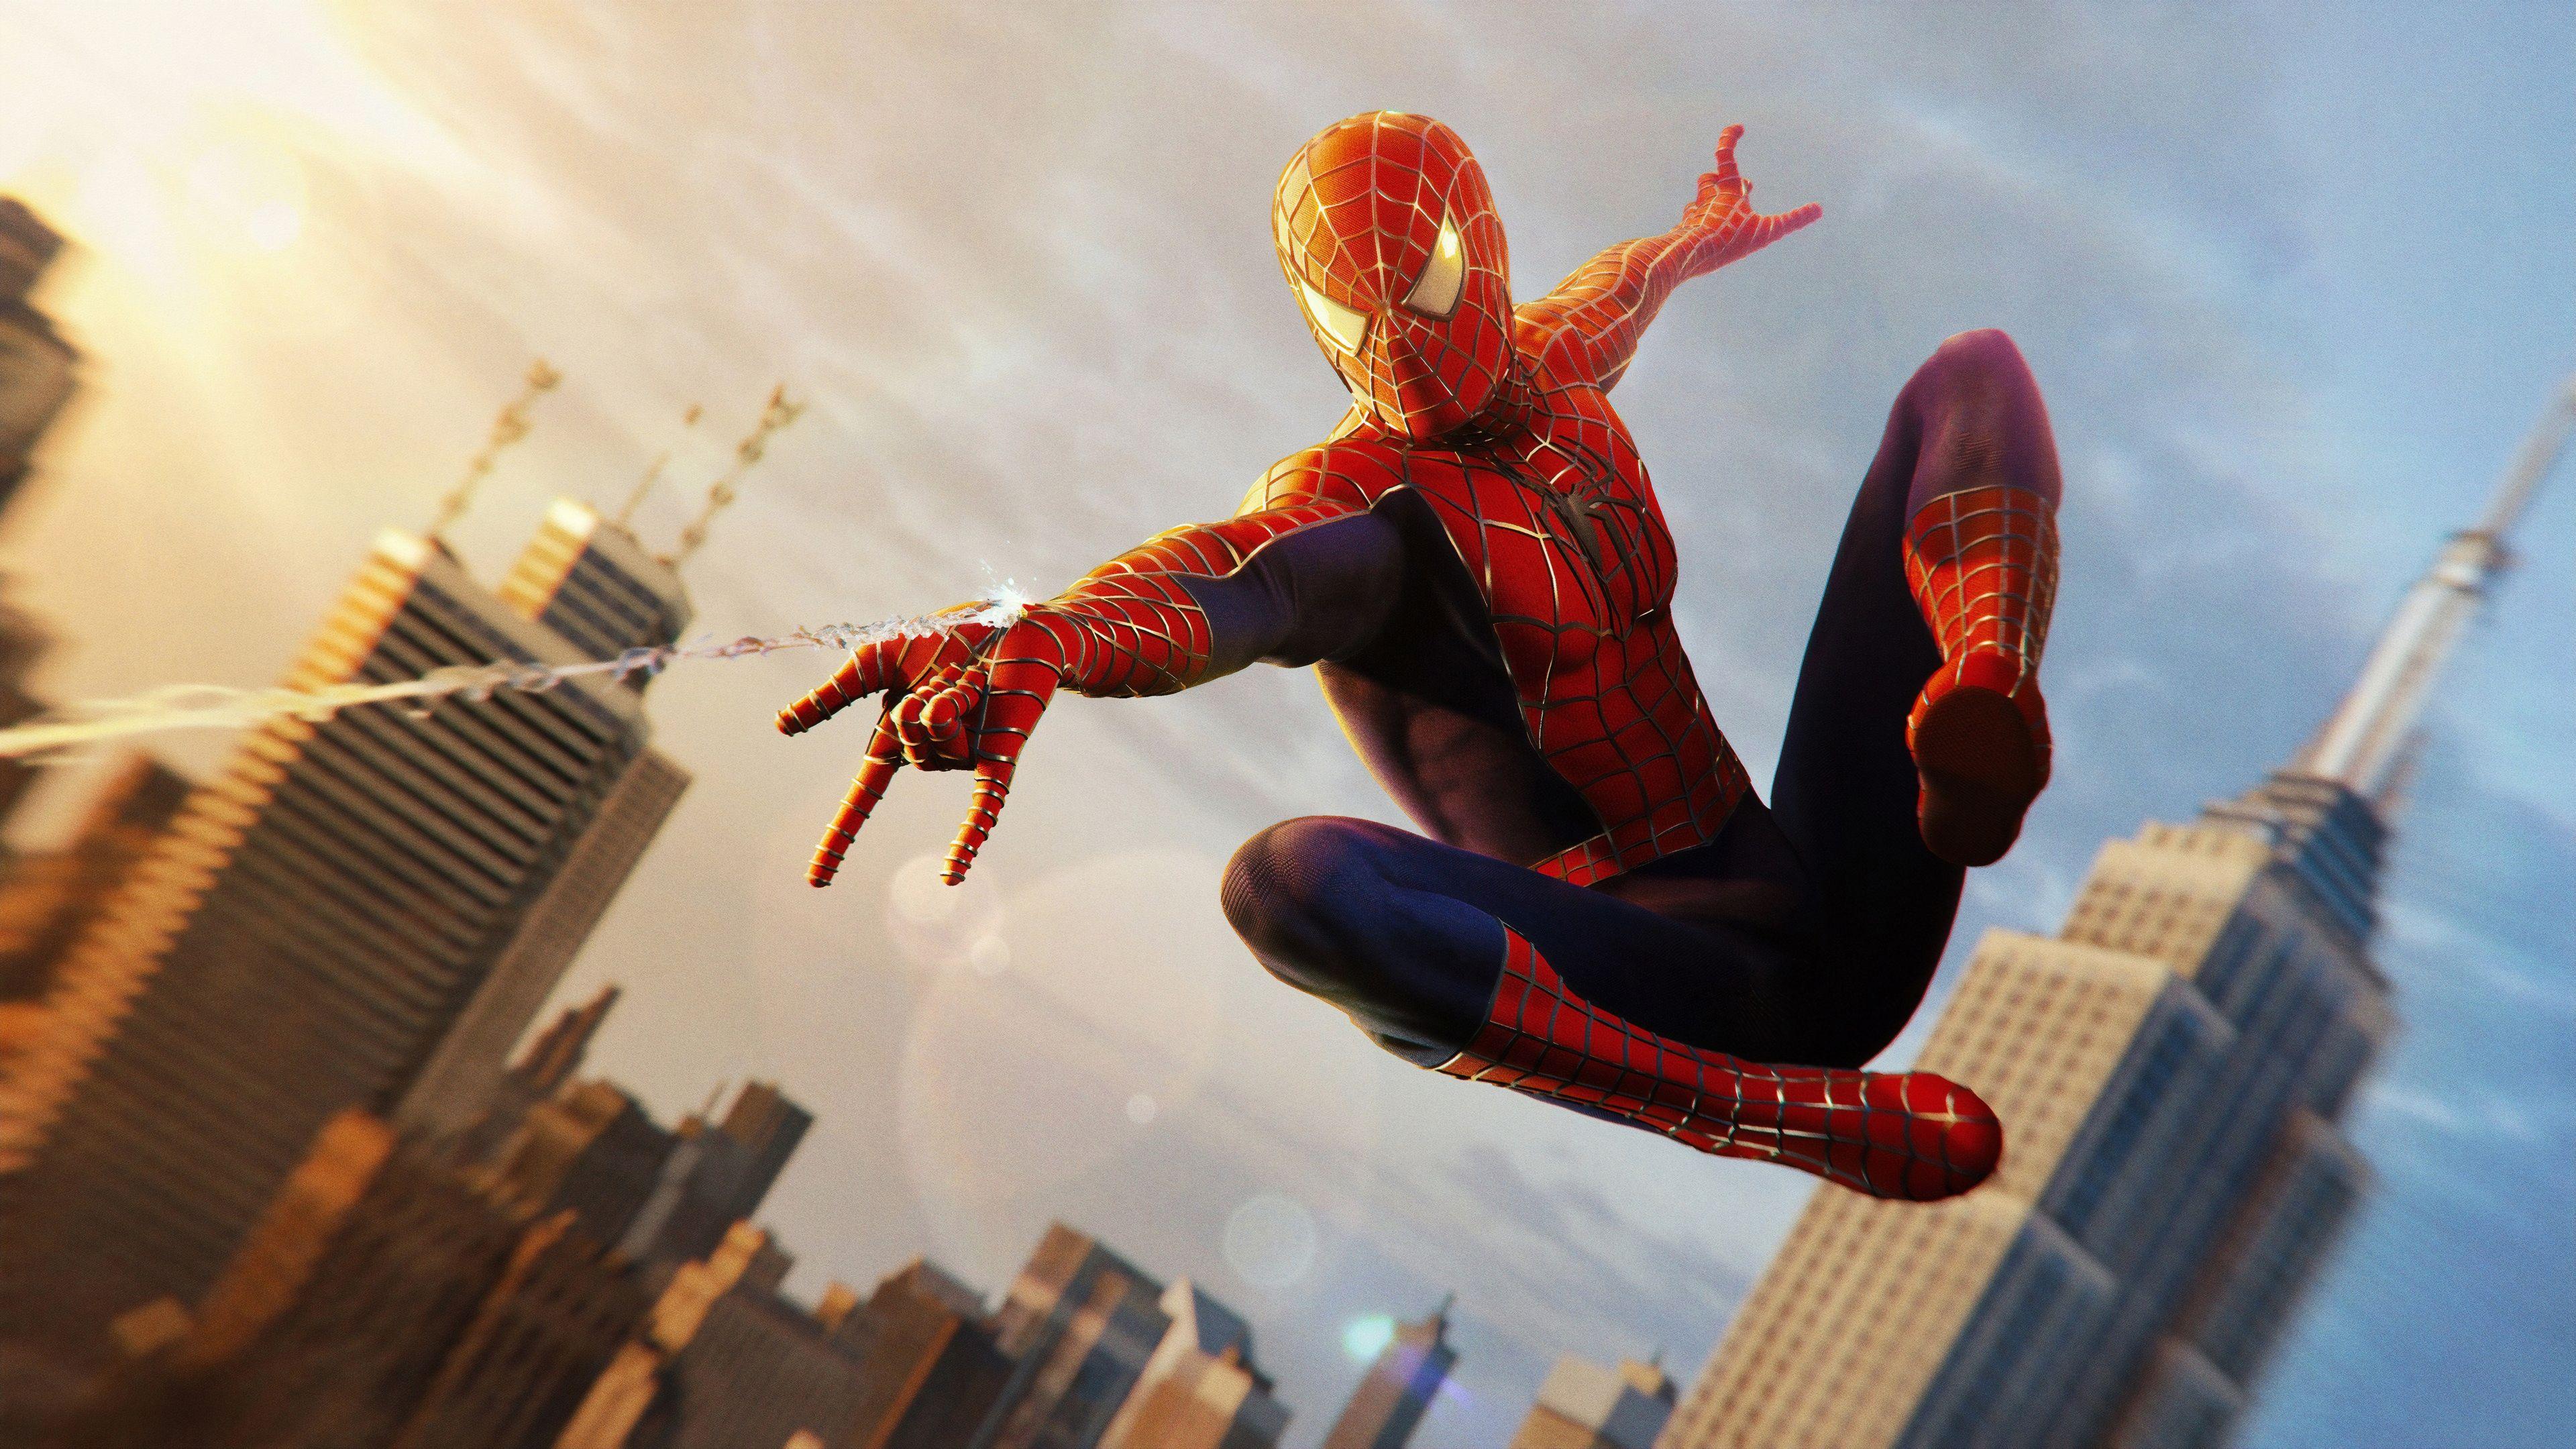 Spiderman 4k Superheroes Wallpapers Spiderman Wallpapers Hd Wallpapers 4k Wallpapers Spiderman Spiderman Ps4 Spiderman Sam Raimi